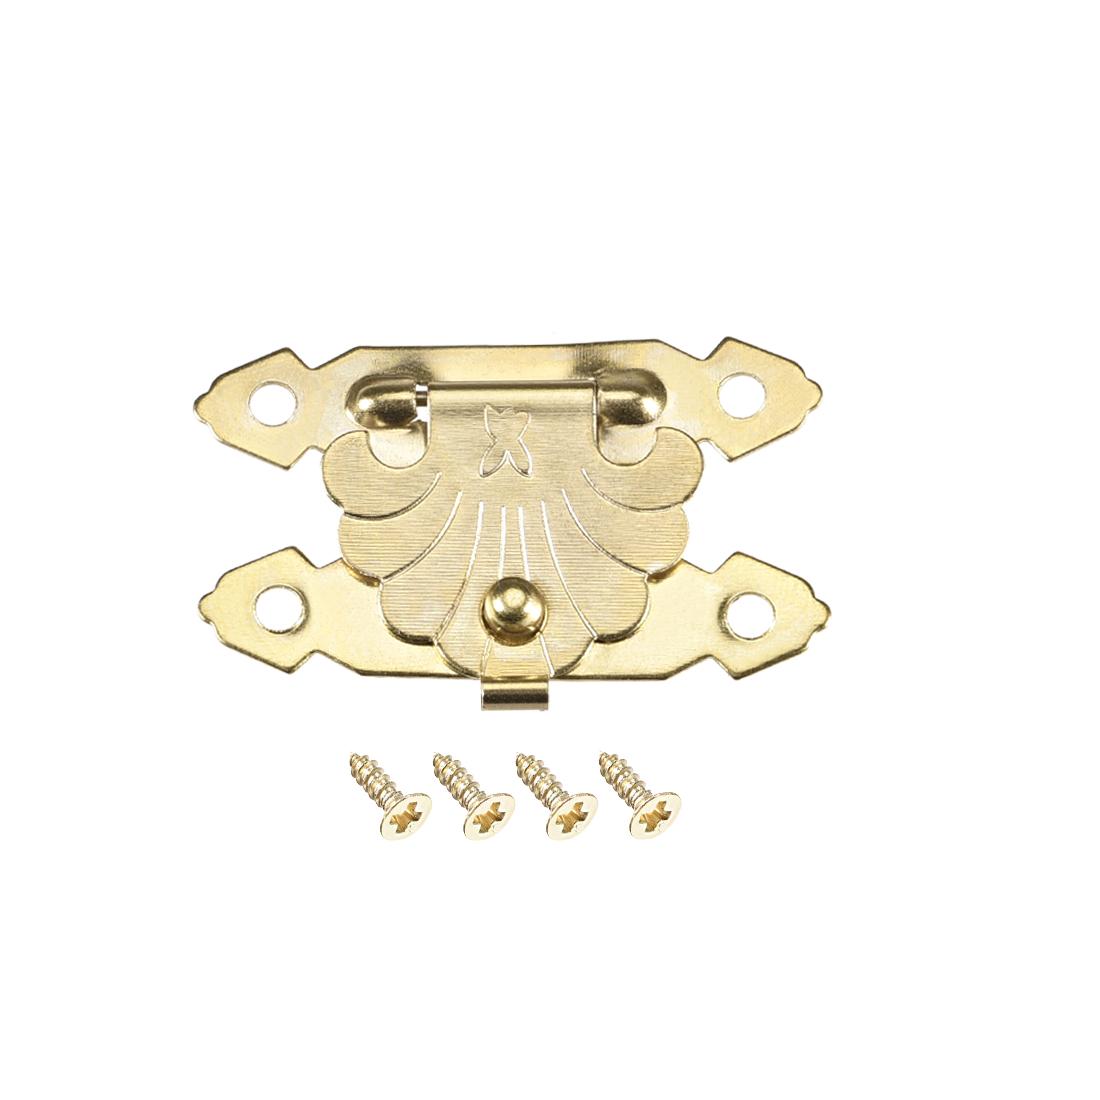 Wood Case Box Rectangle Hasp 38x23mm Zinc Alloy Antique Latches Yellow, 10 Pcs